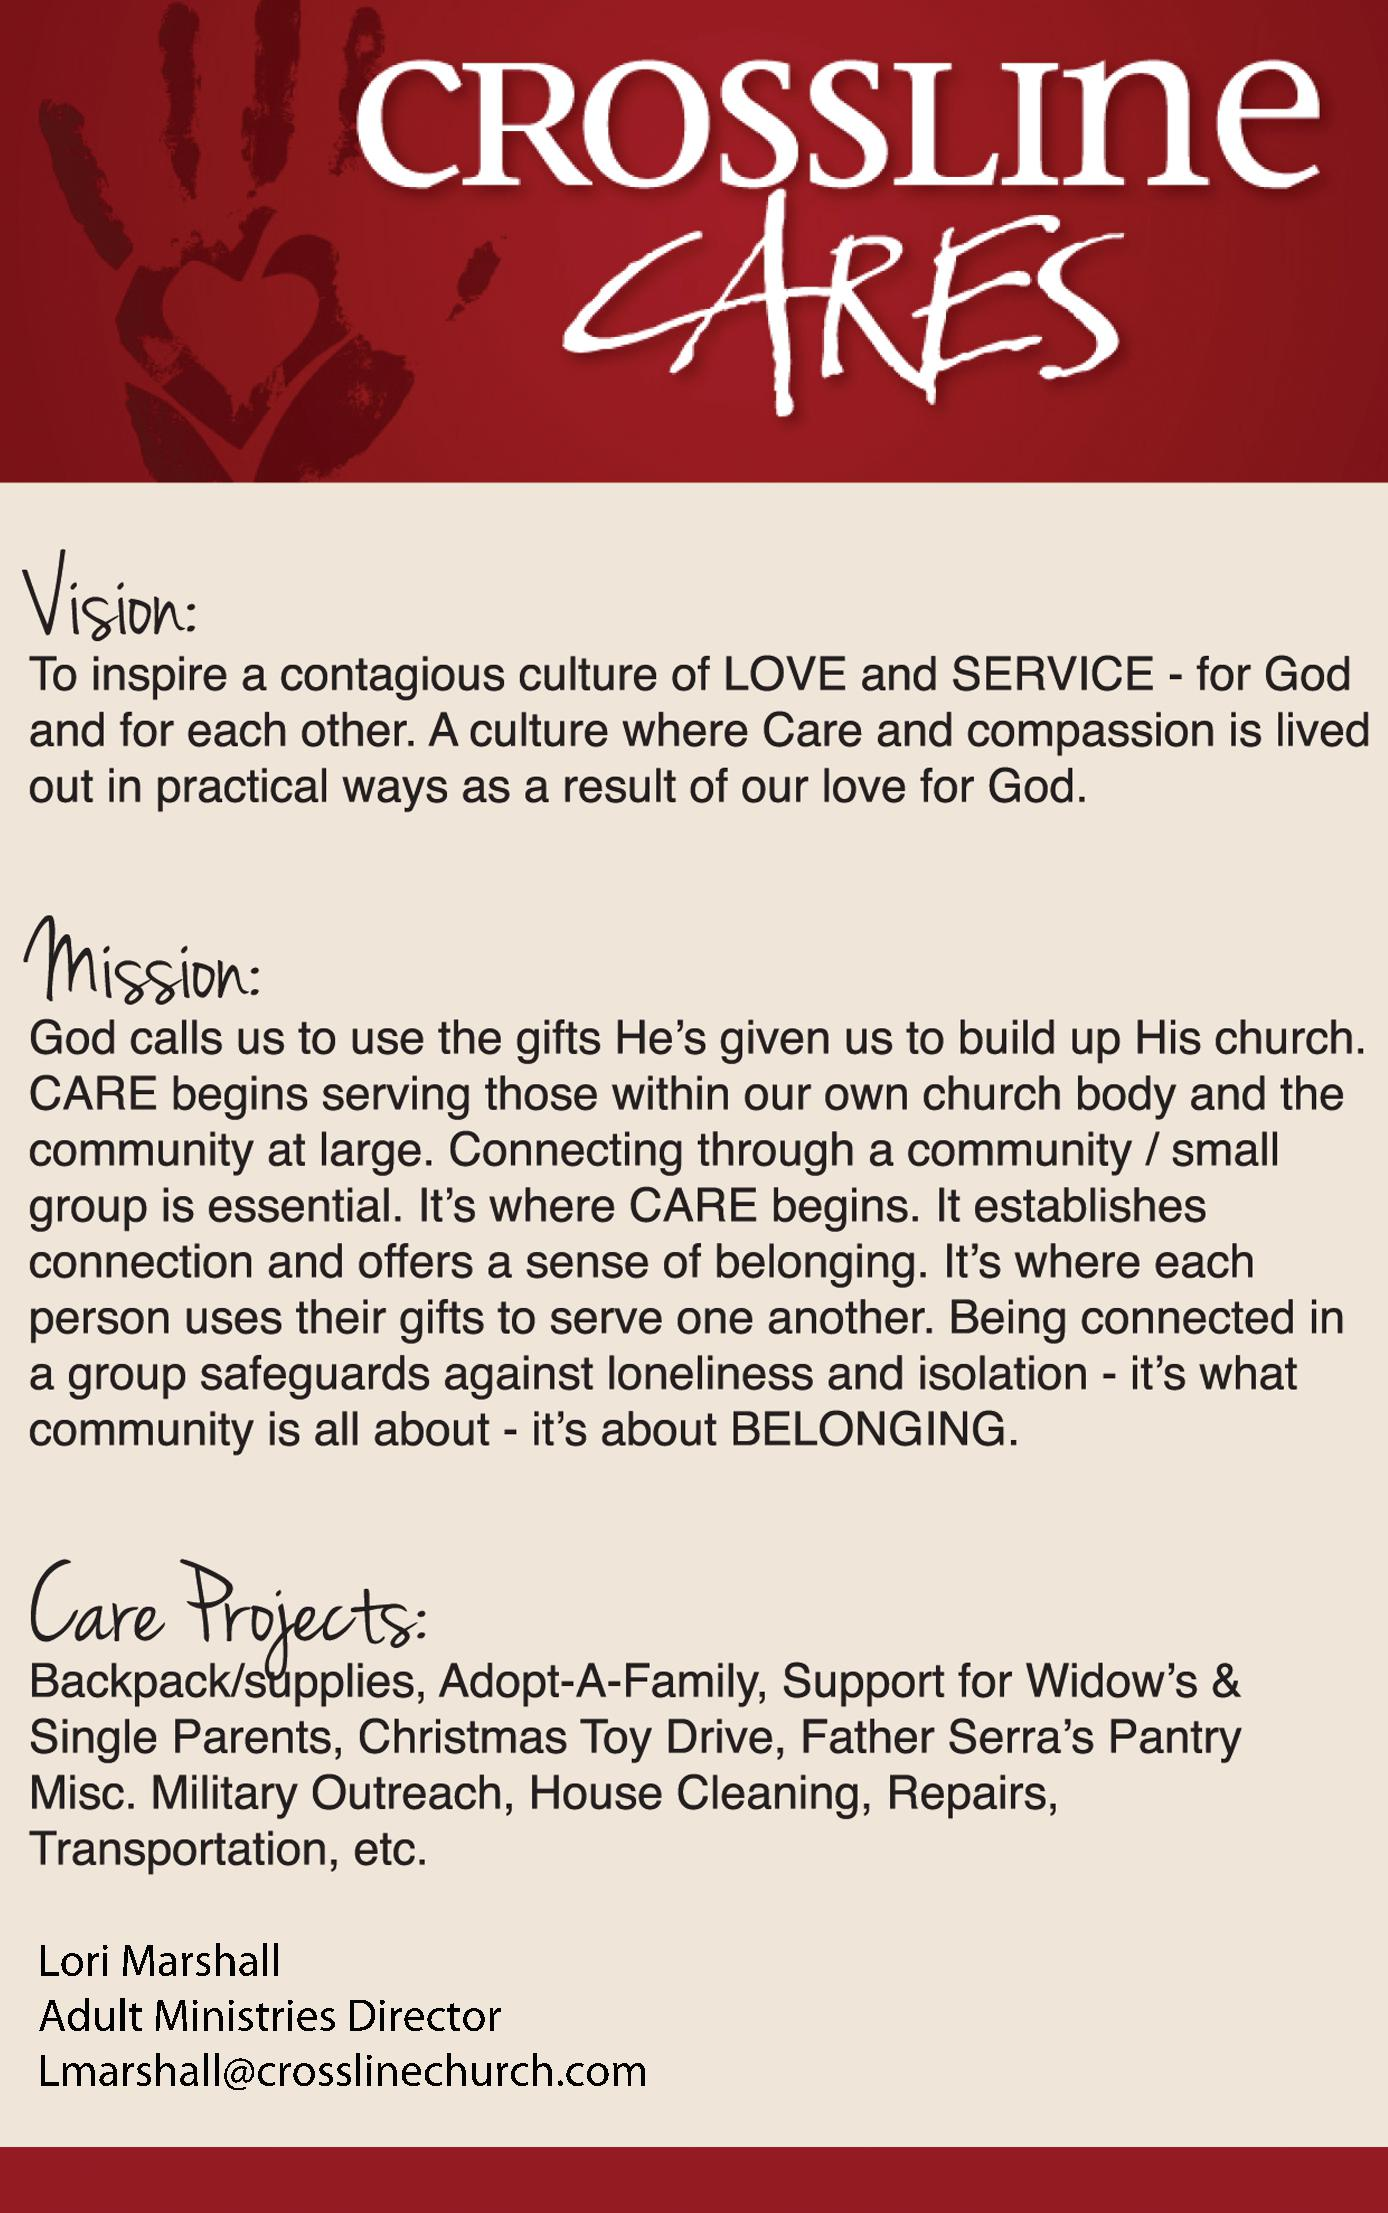 Crossline - Cares Ministry